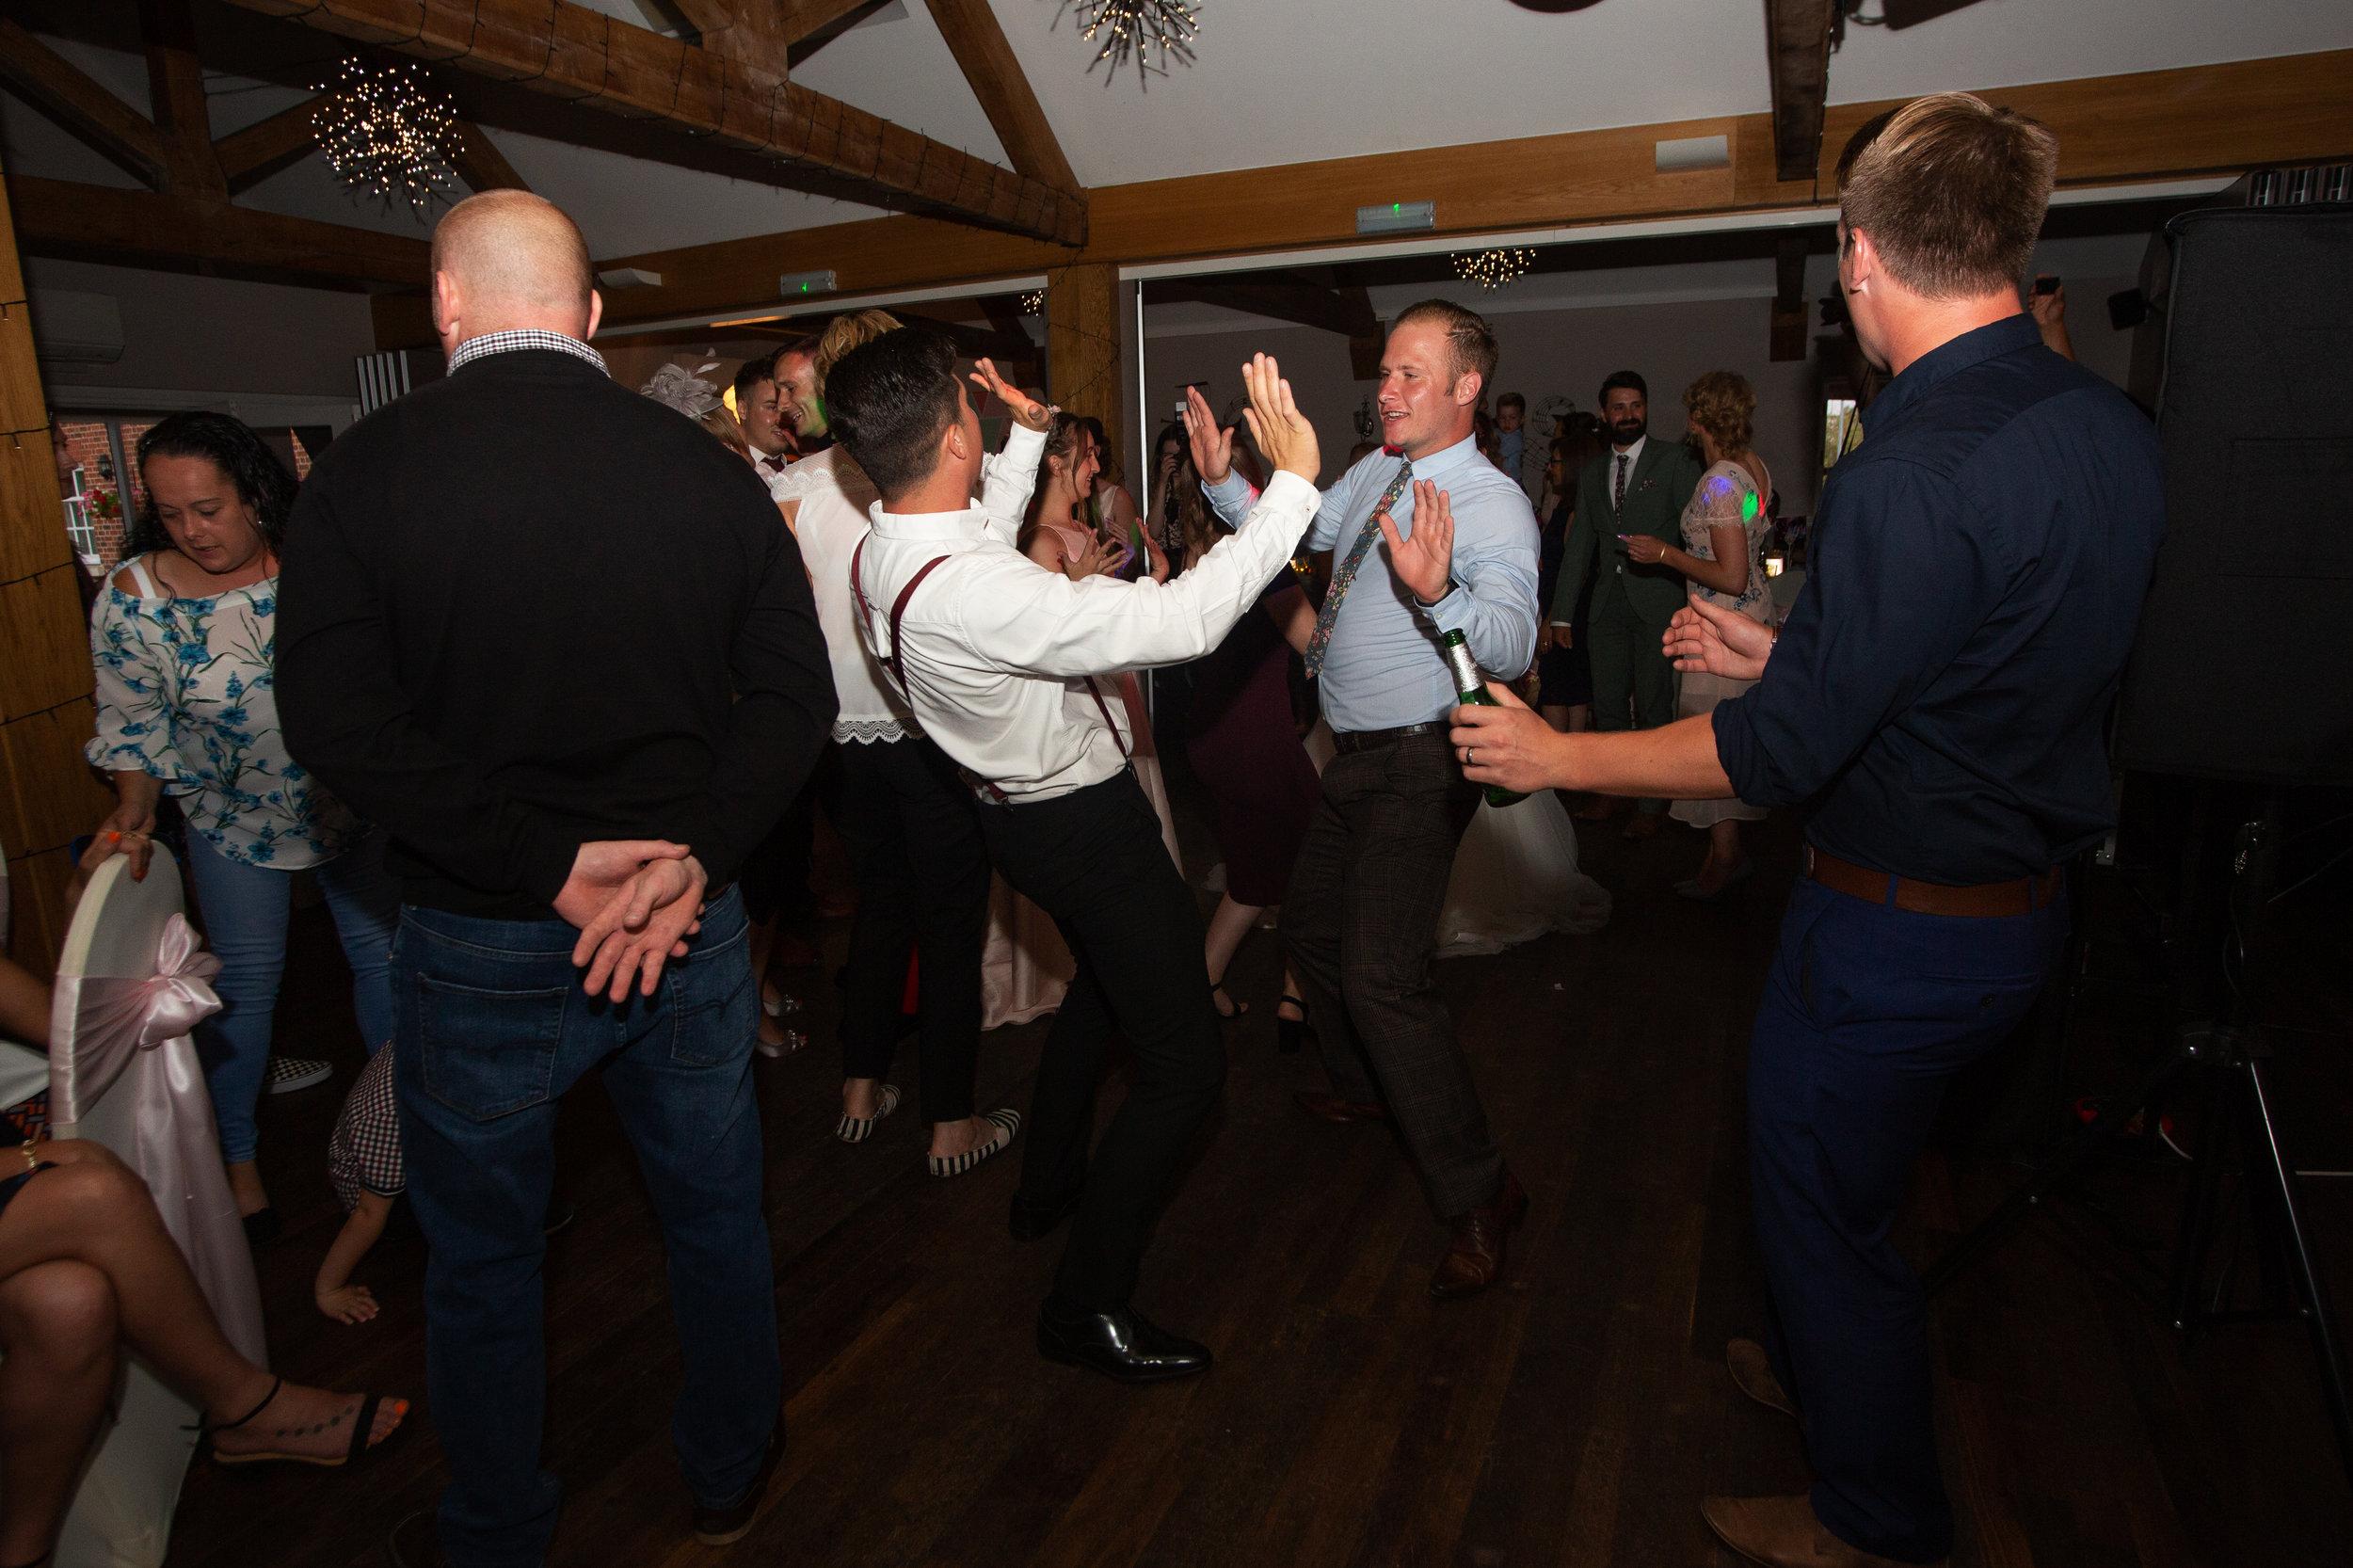 wedding-lea-cooper-photography-willenhall-west-midlands-wolverhampton-dudley-birmingham-uk-marriage-hadley-park-east-telford-crazy-dance.jpg